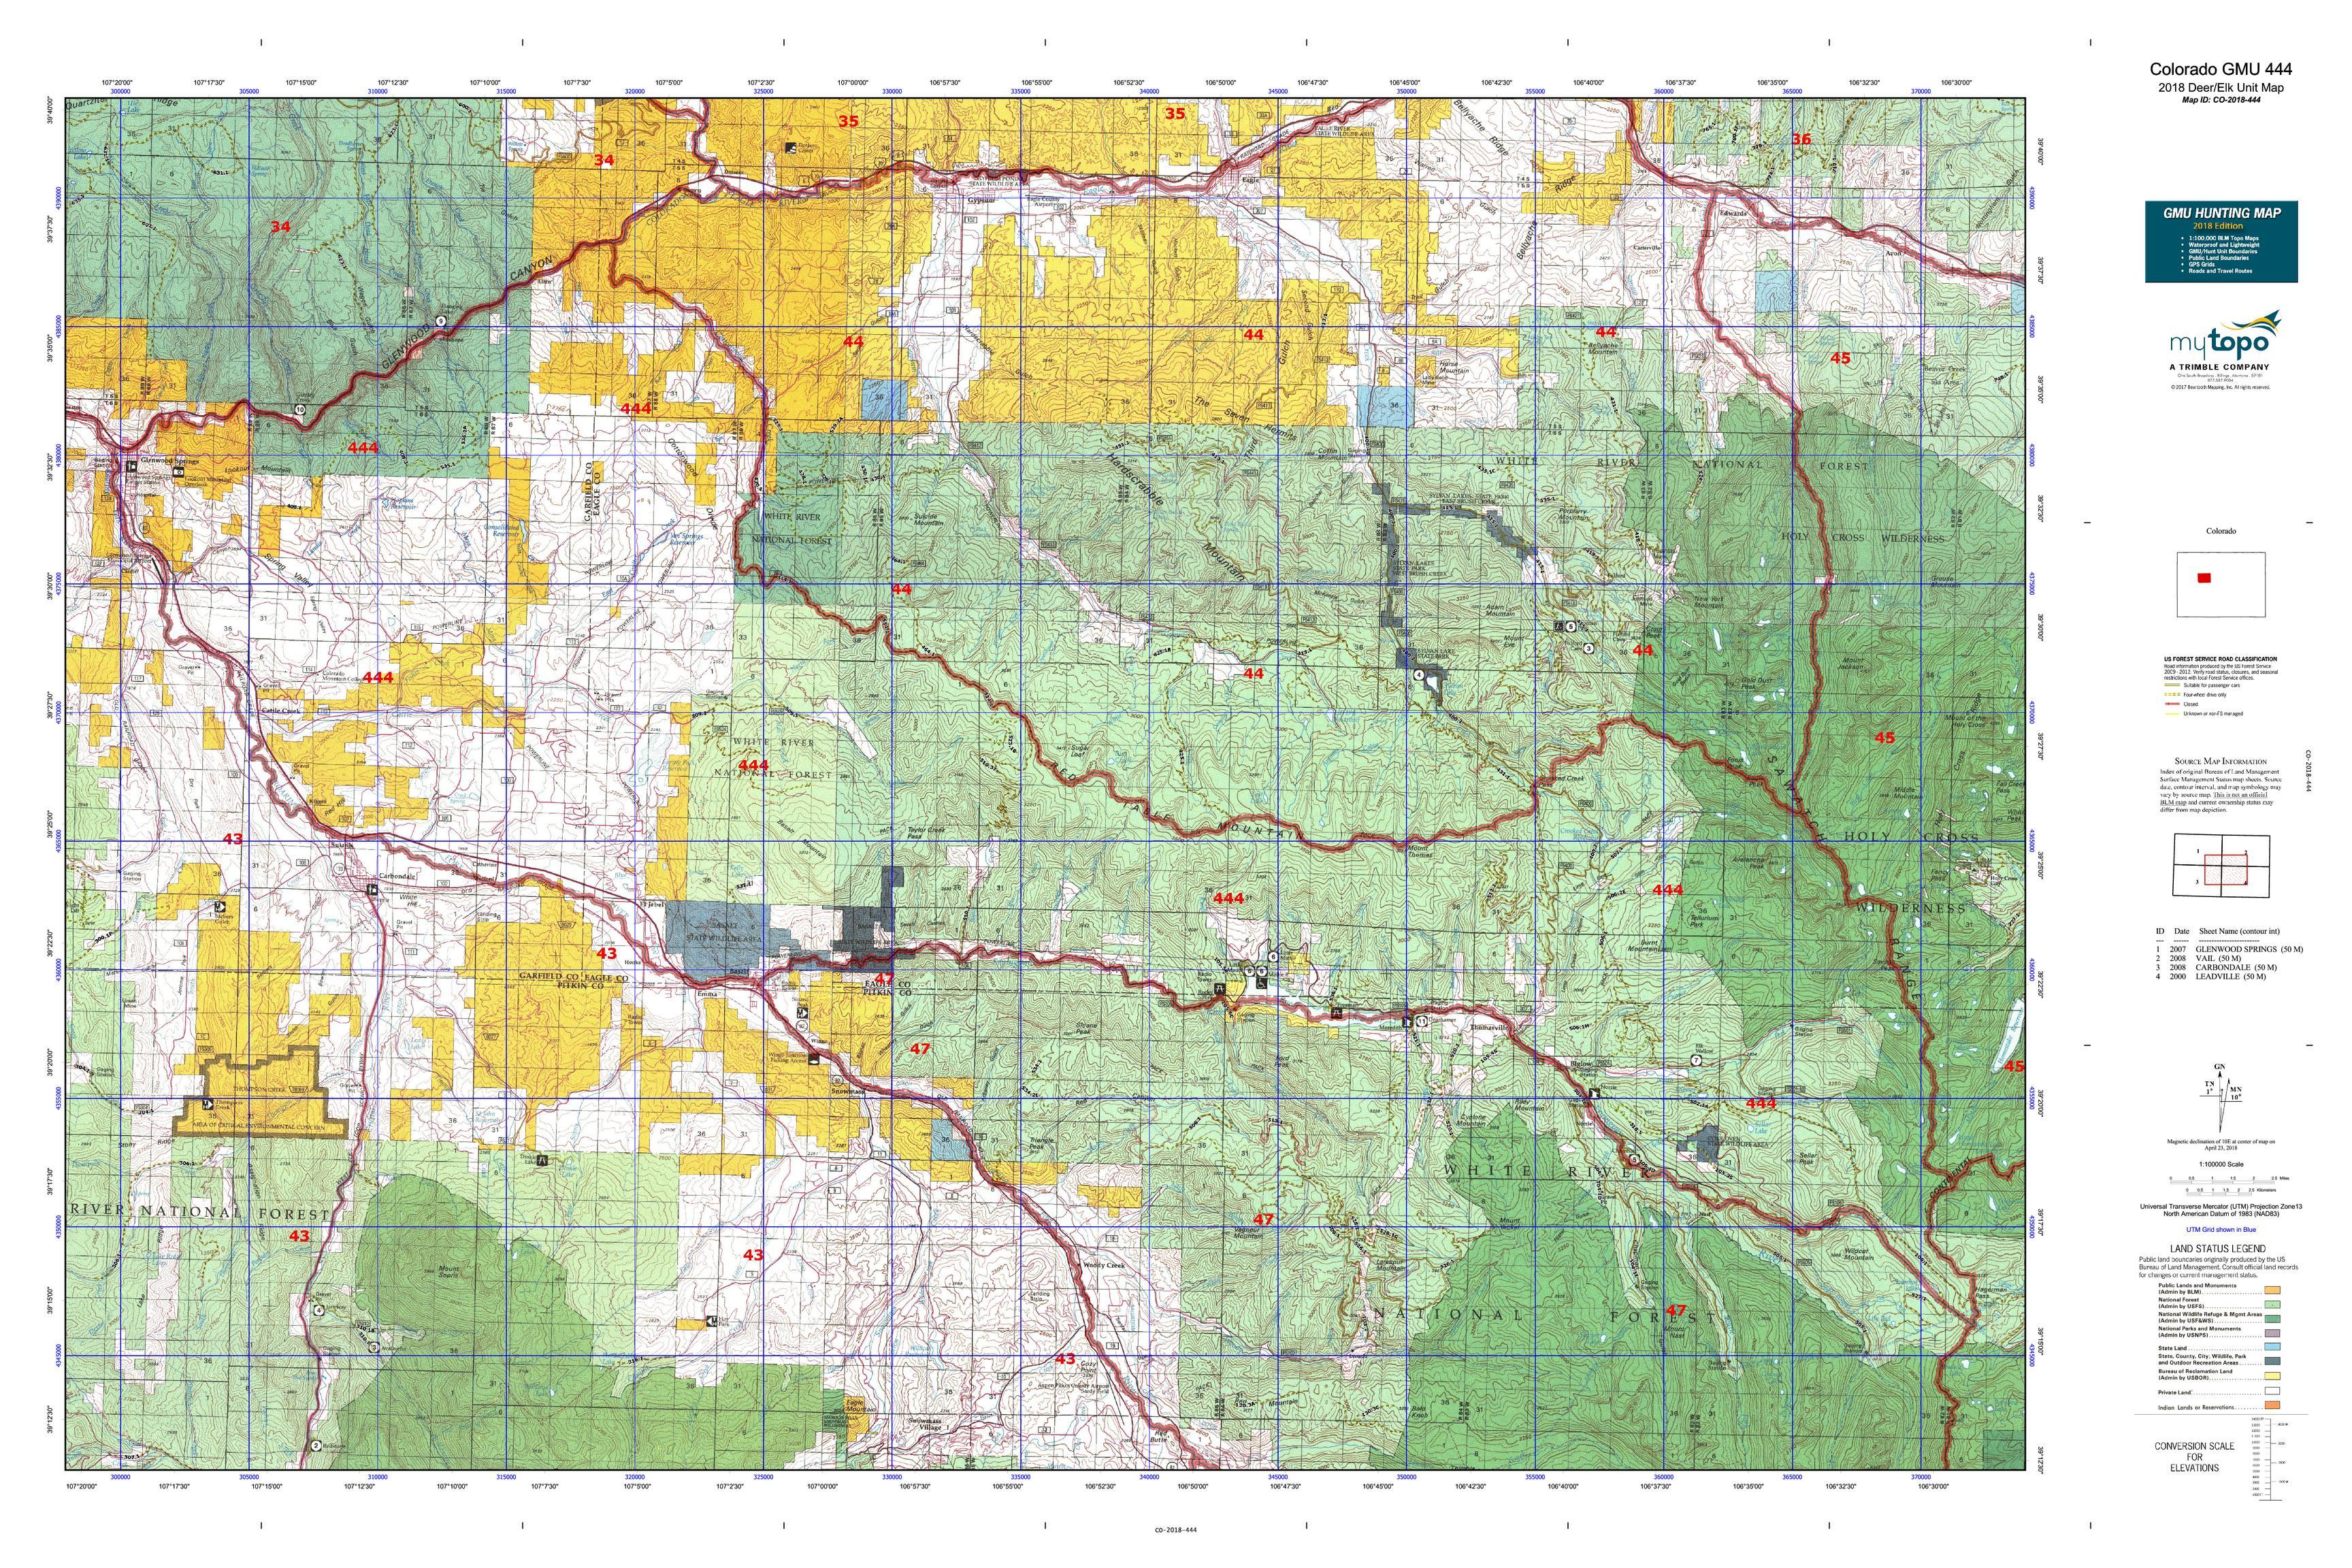 Colorado GMU 444 Map | MyTopo